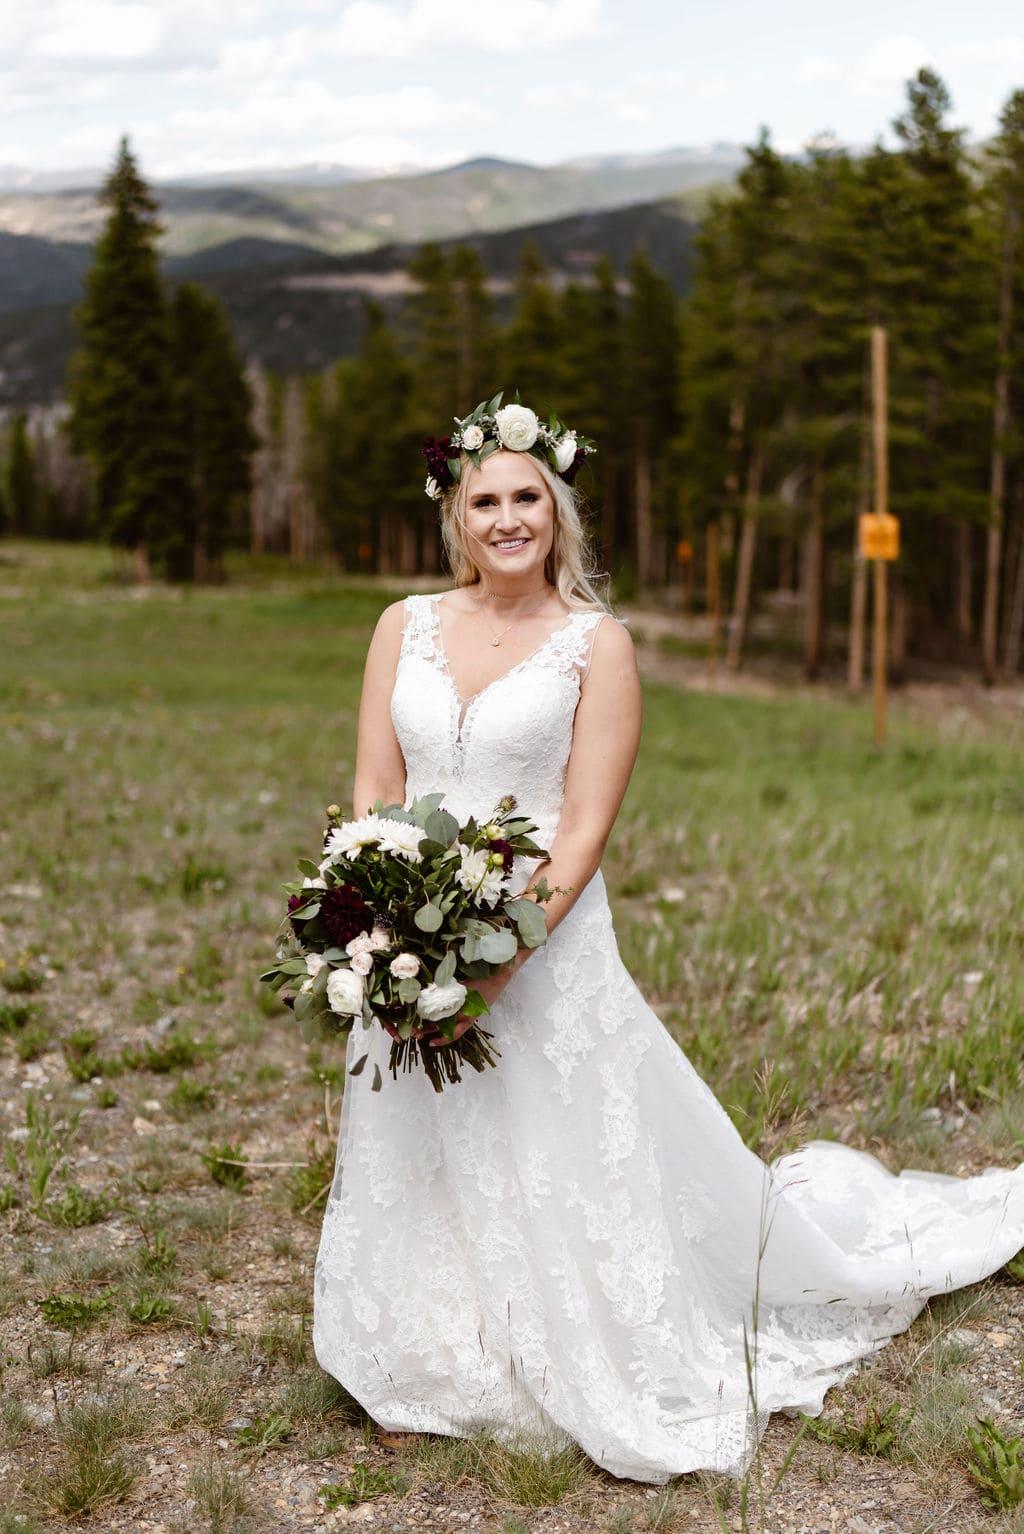 Bridal Portrait at Ten Mile Station